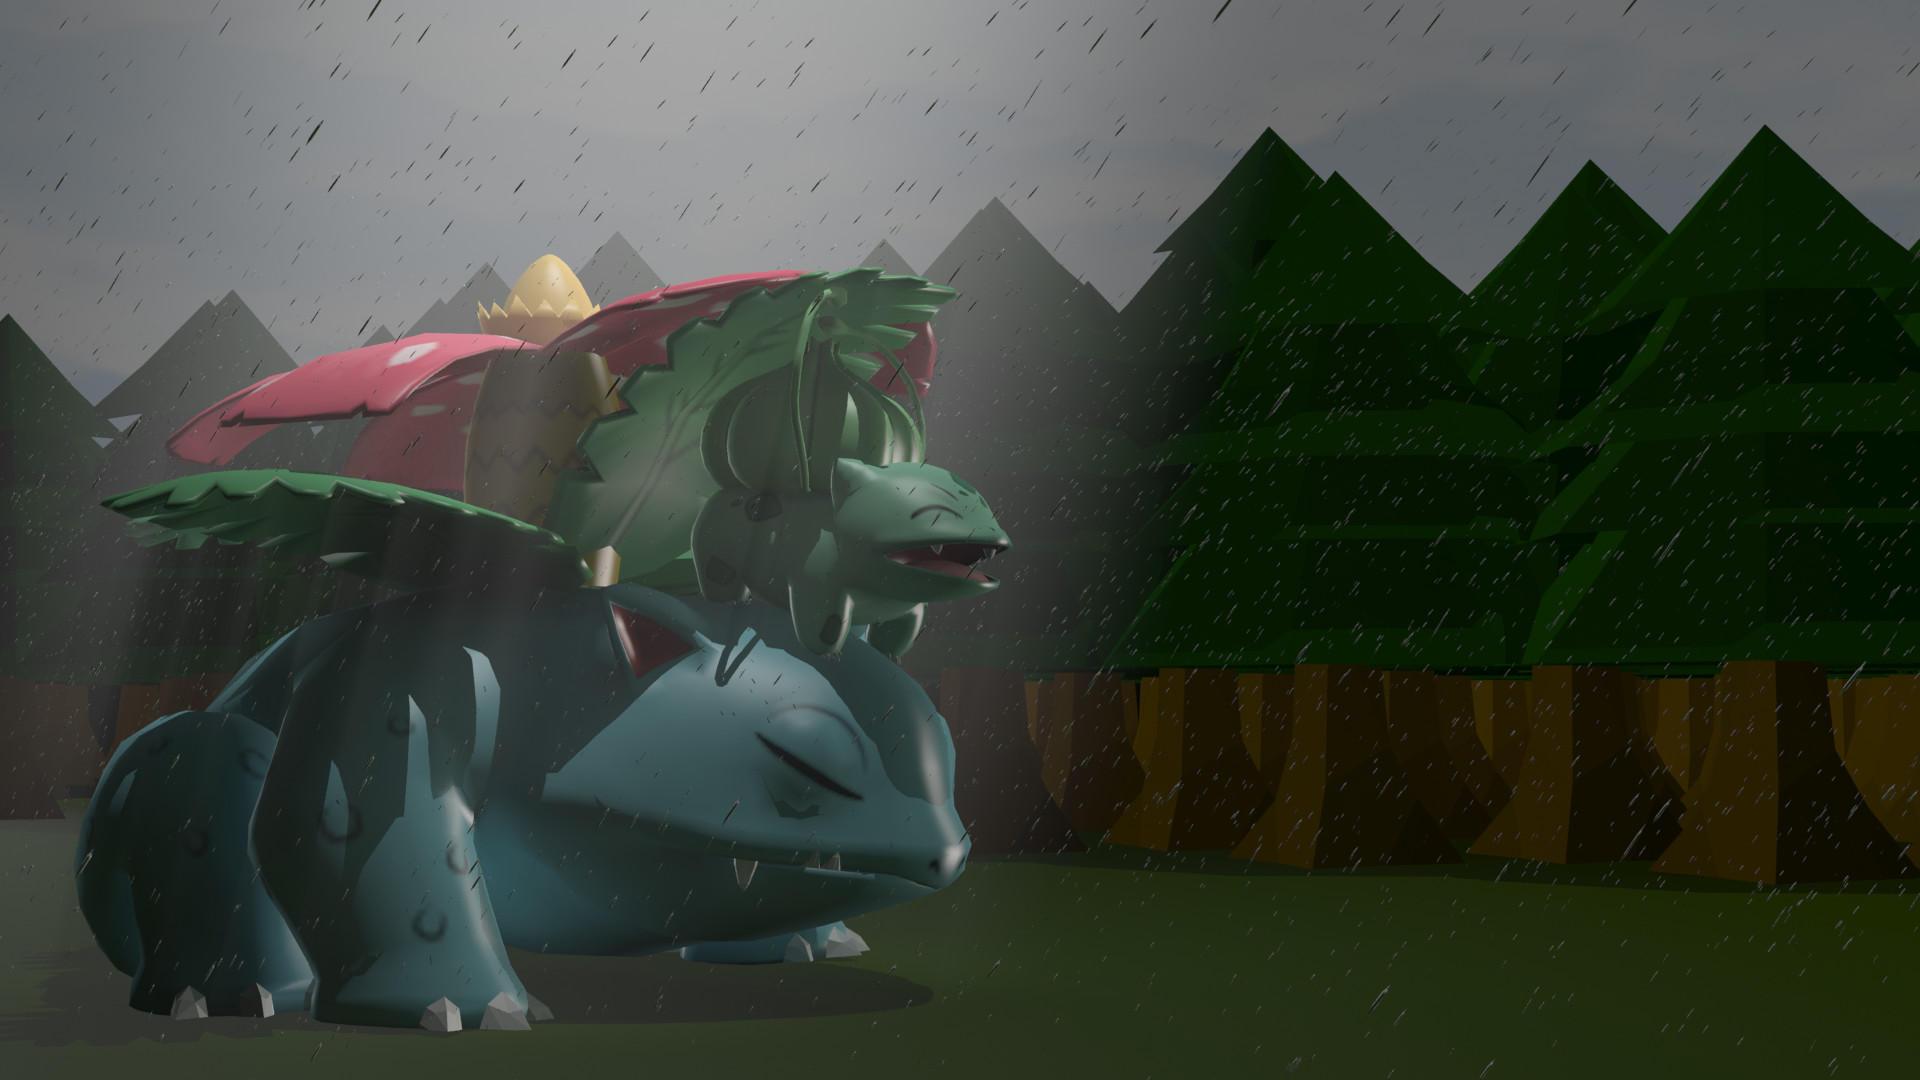 Rainy days by Tassadoul